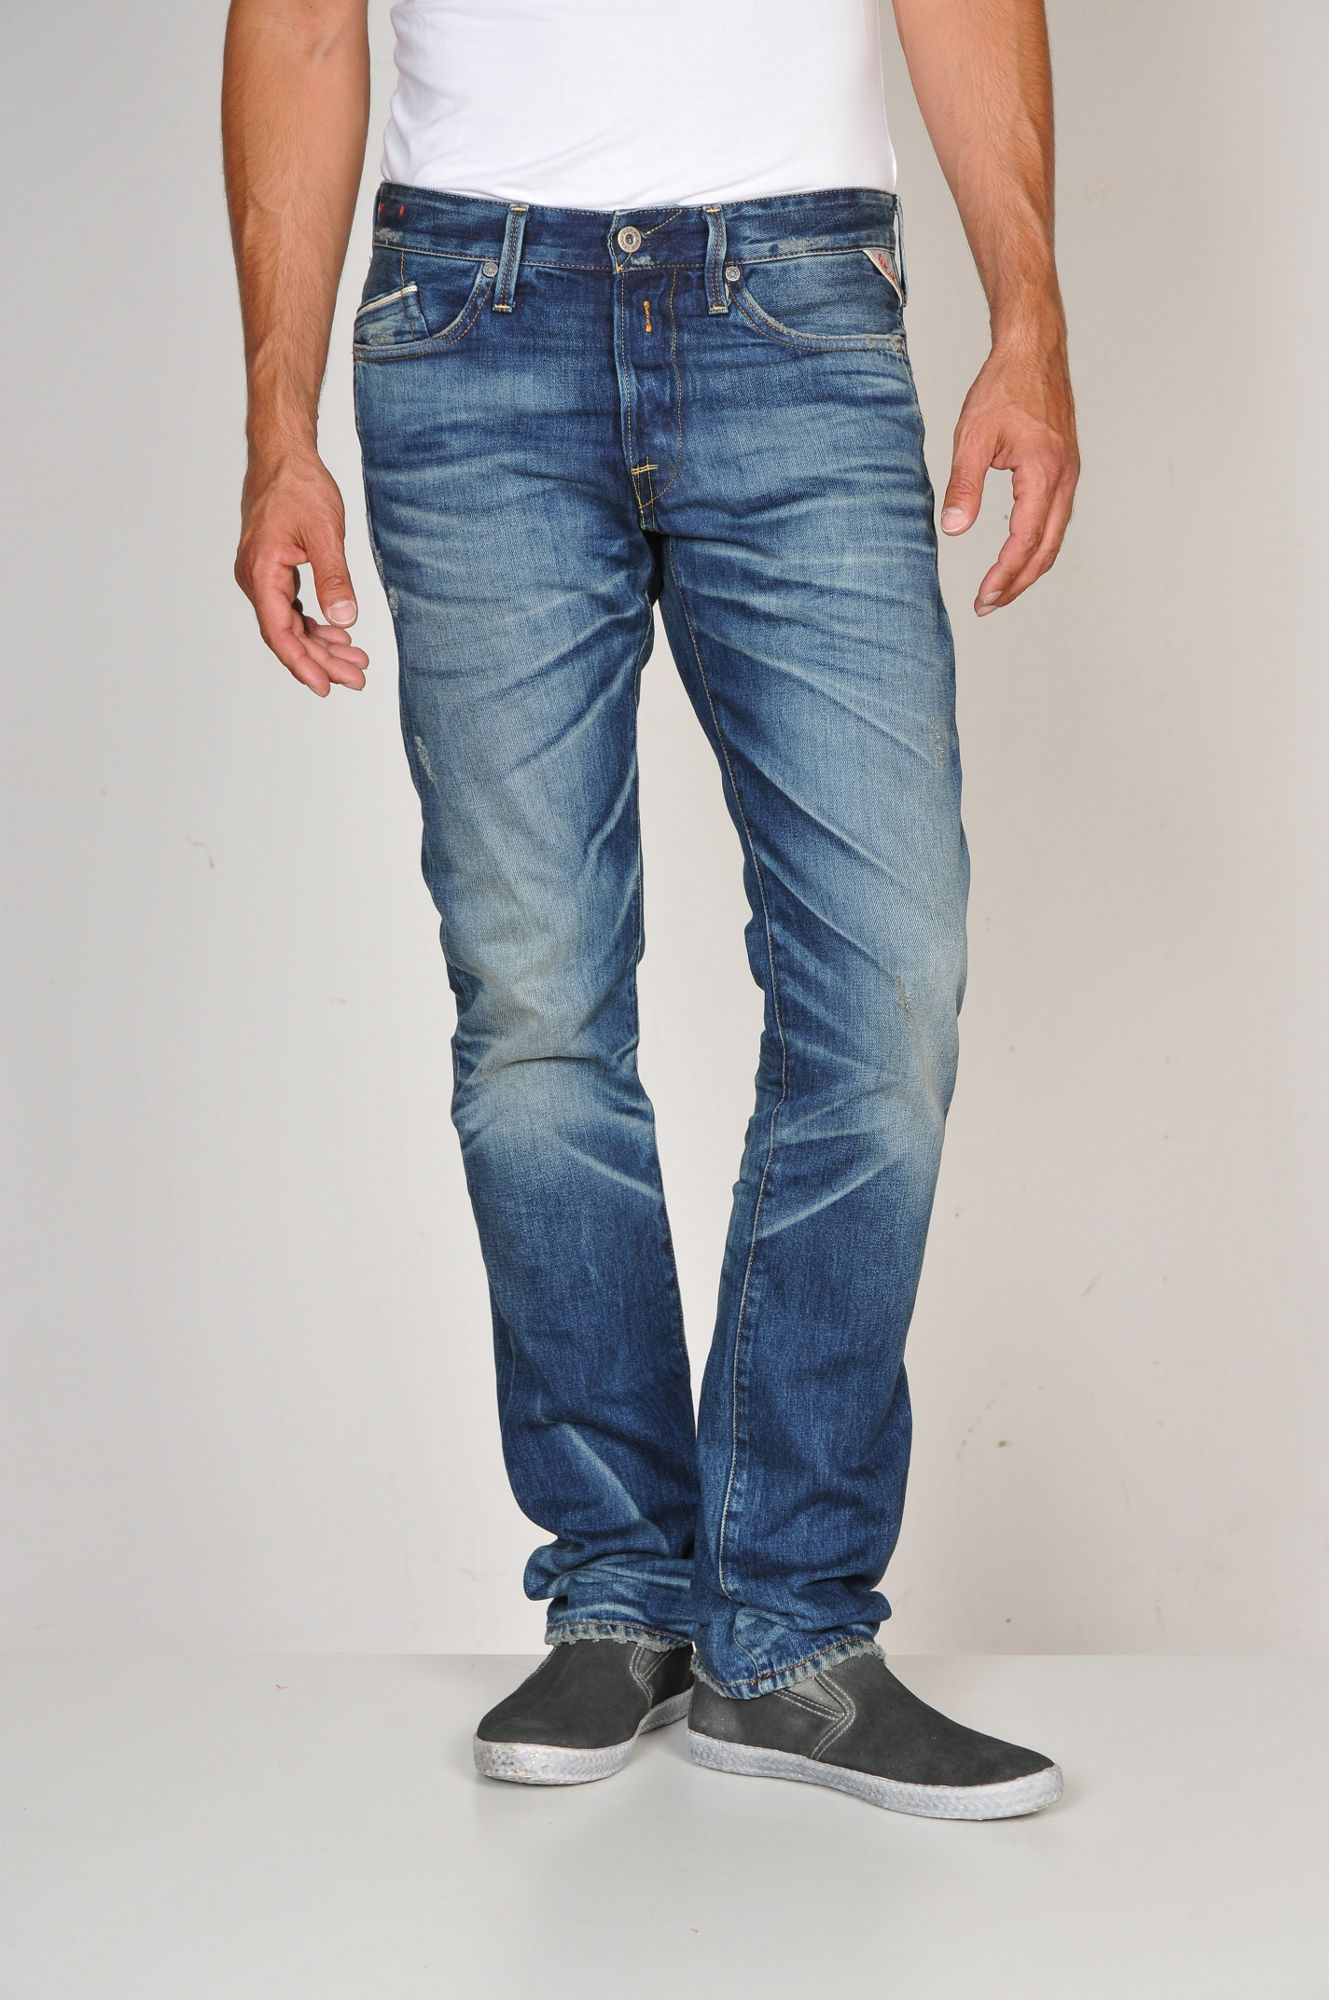 replay waitom 502 regular slim fit jeans in blue for men lyst. Black Bedroom Furniture Sets. Home Design Ideas